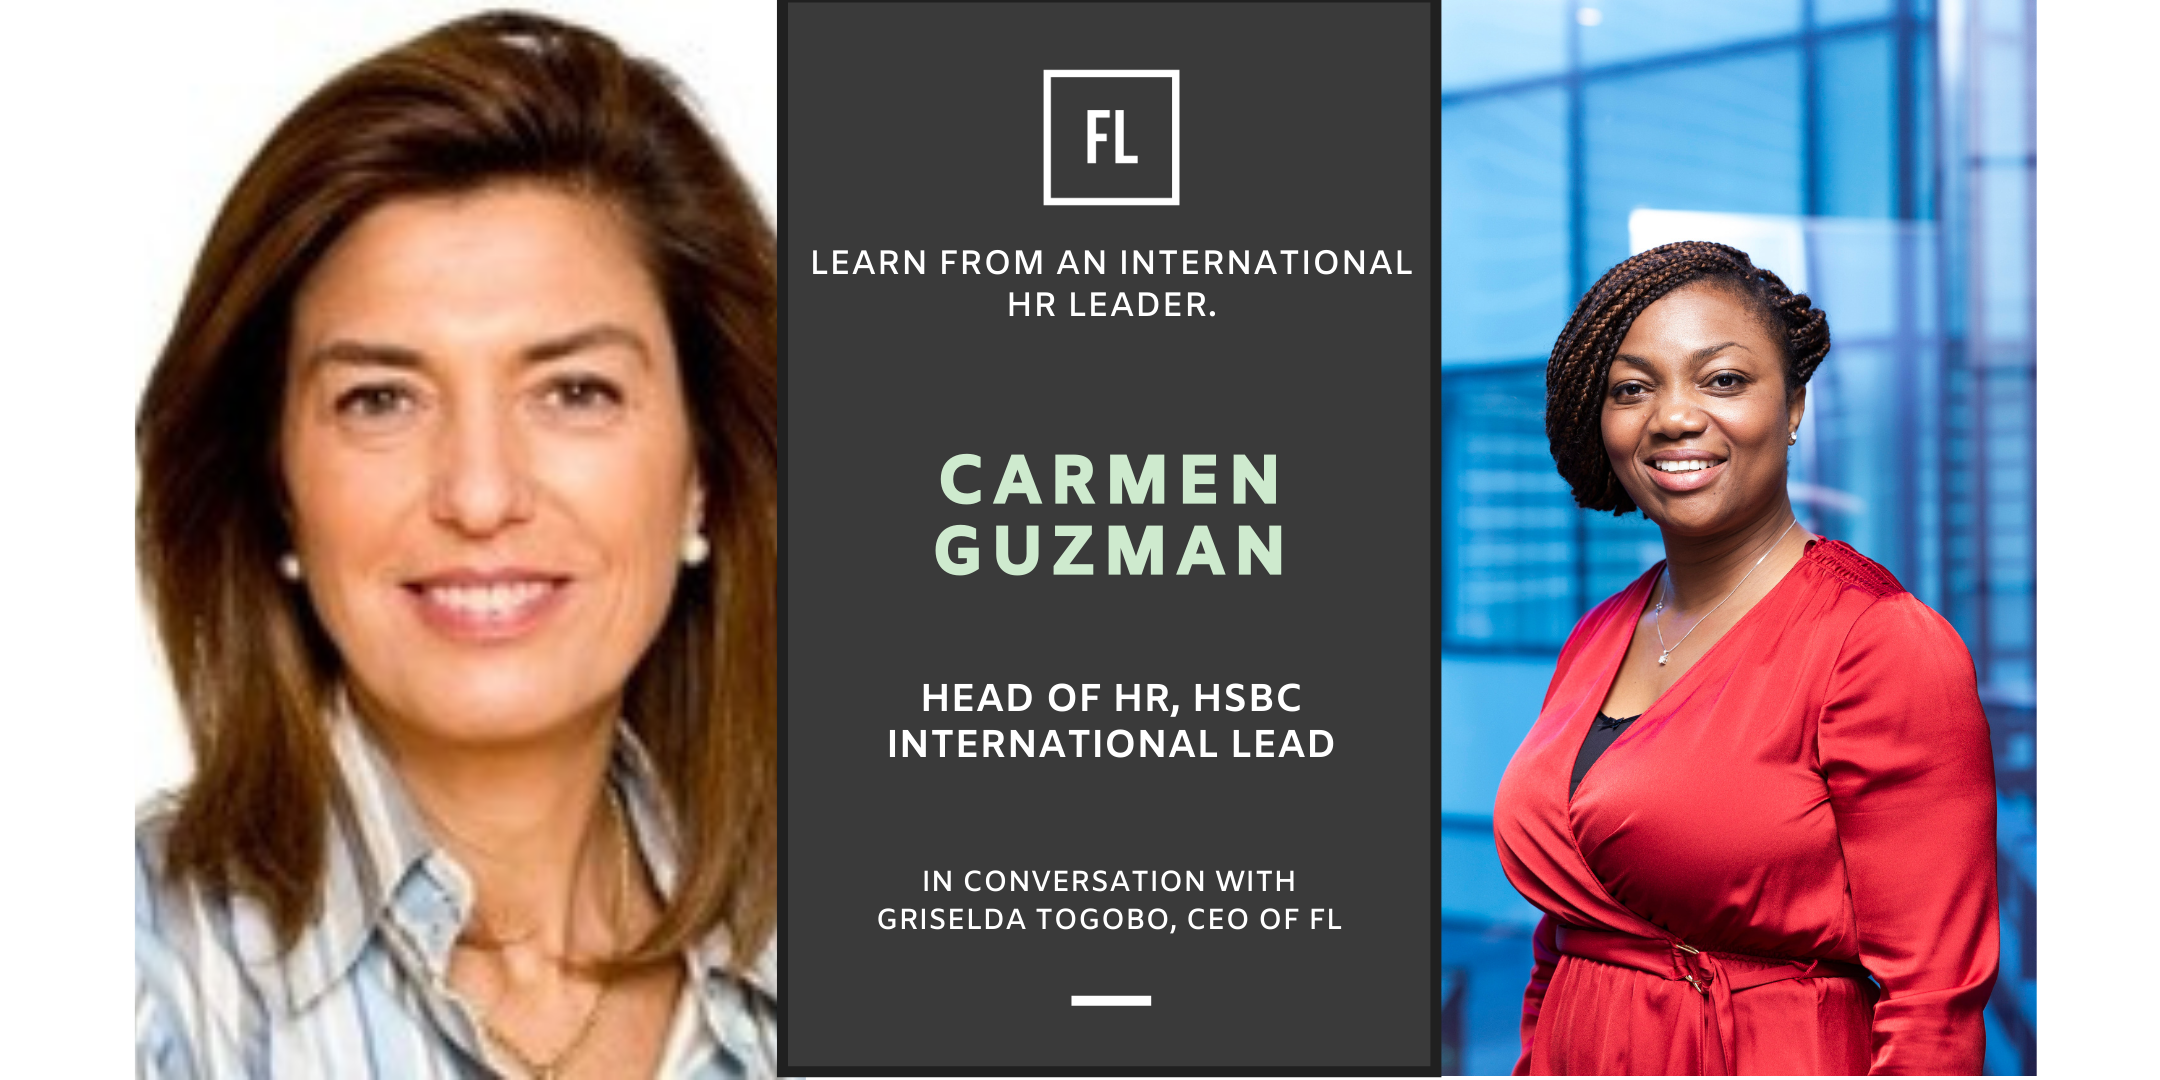 In Conversation With Carmen Guzman, Head of HR, HSBC